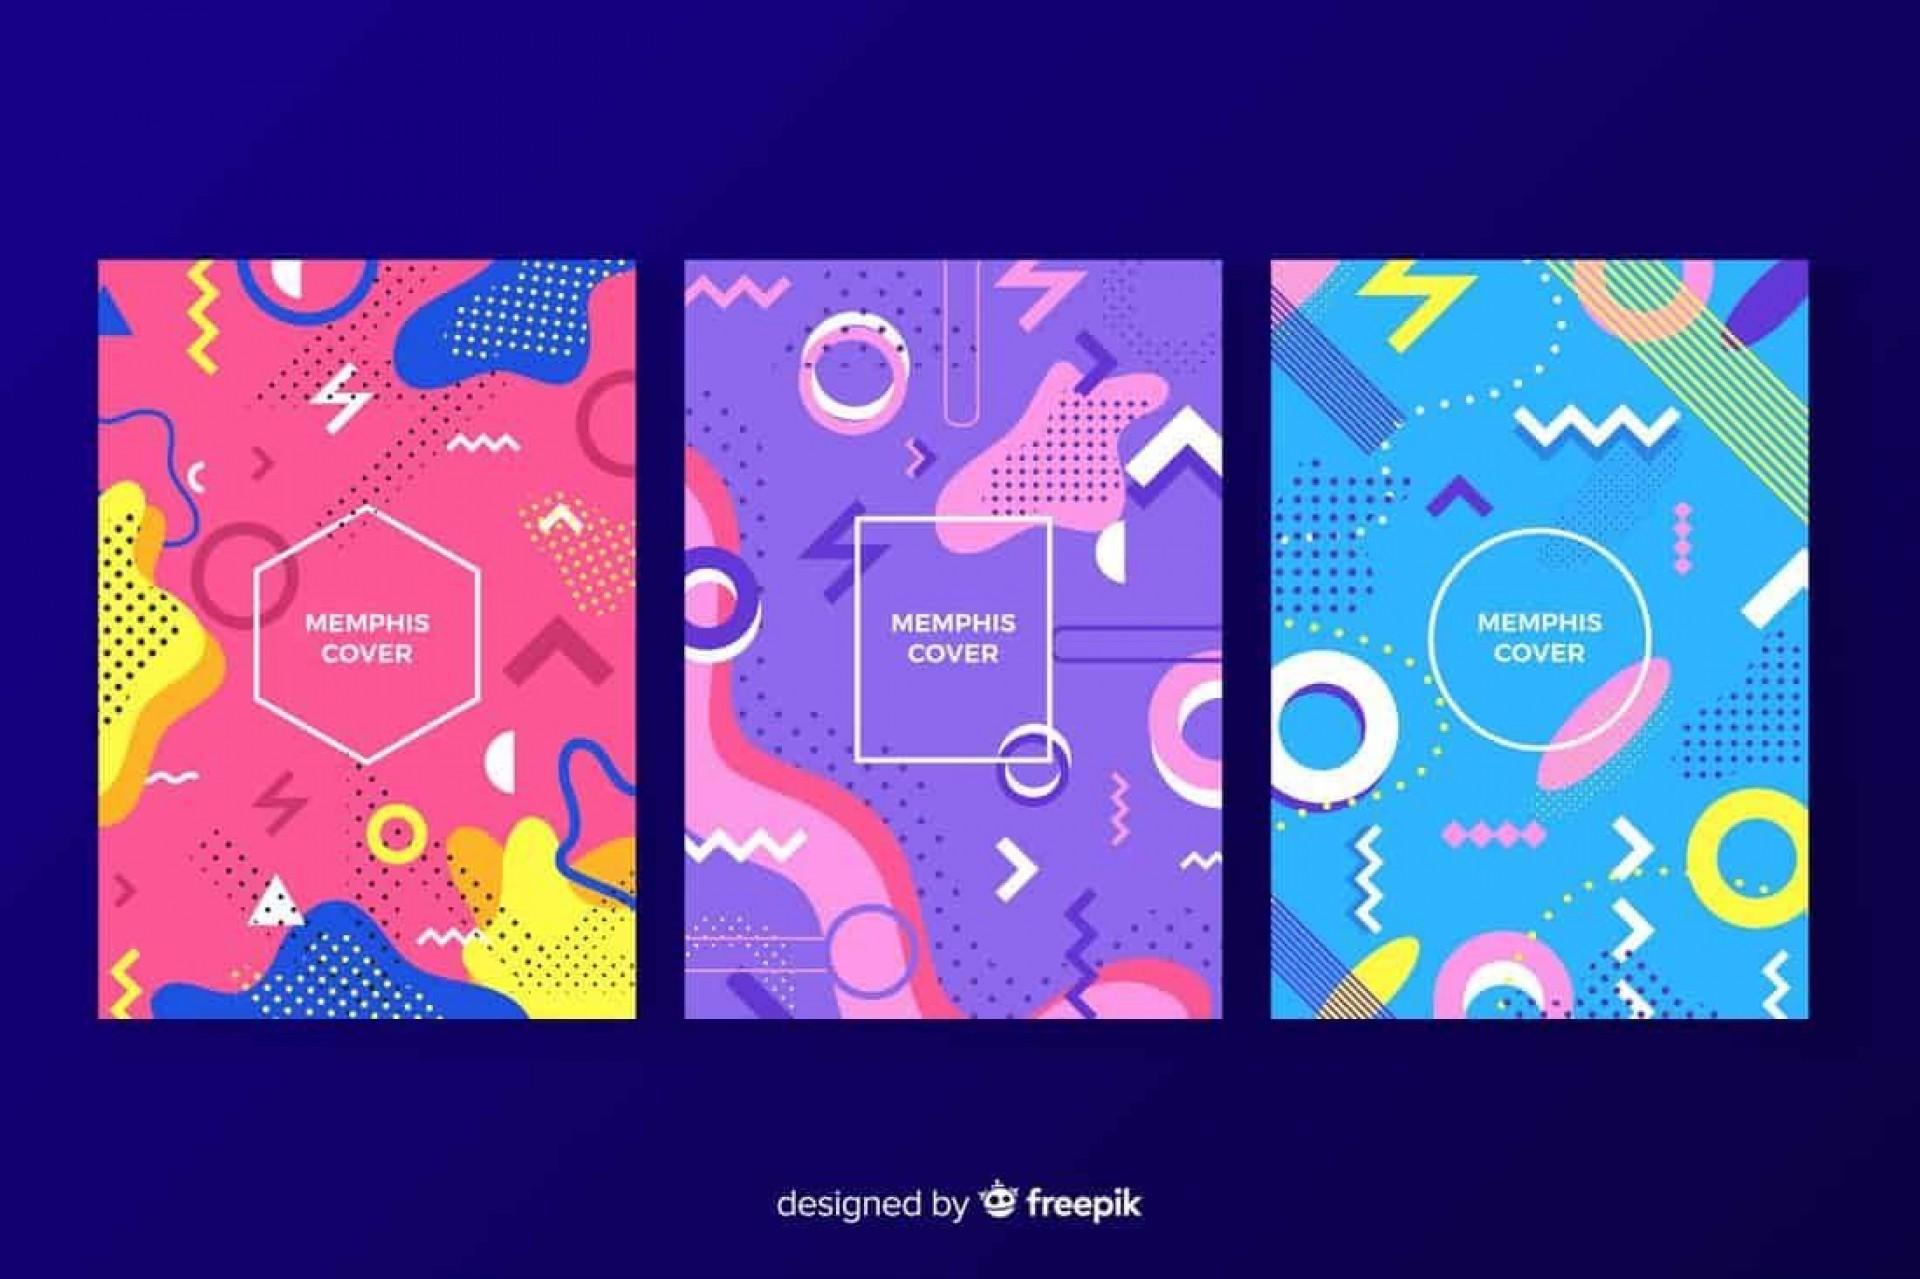 007 Fantastic Event Flyer Template Free Design  Word Download Psd1920